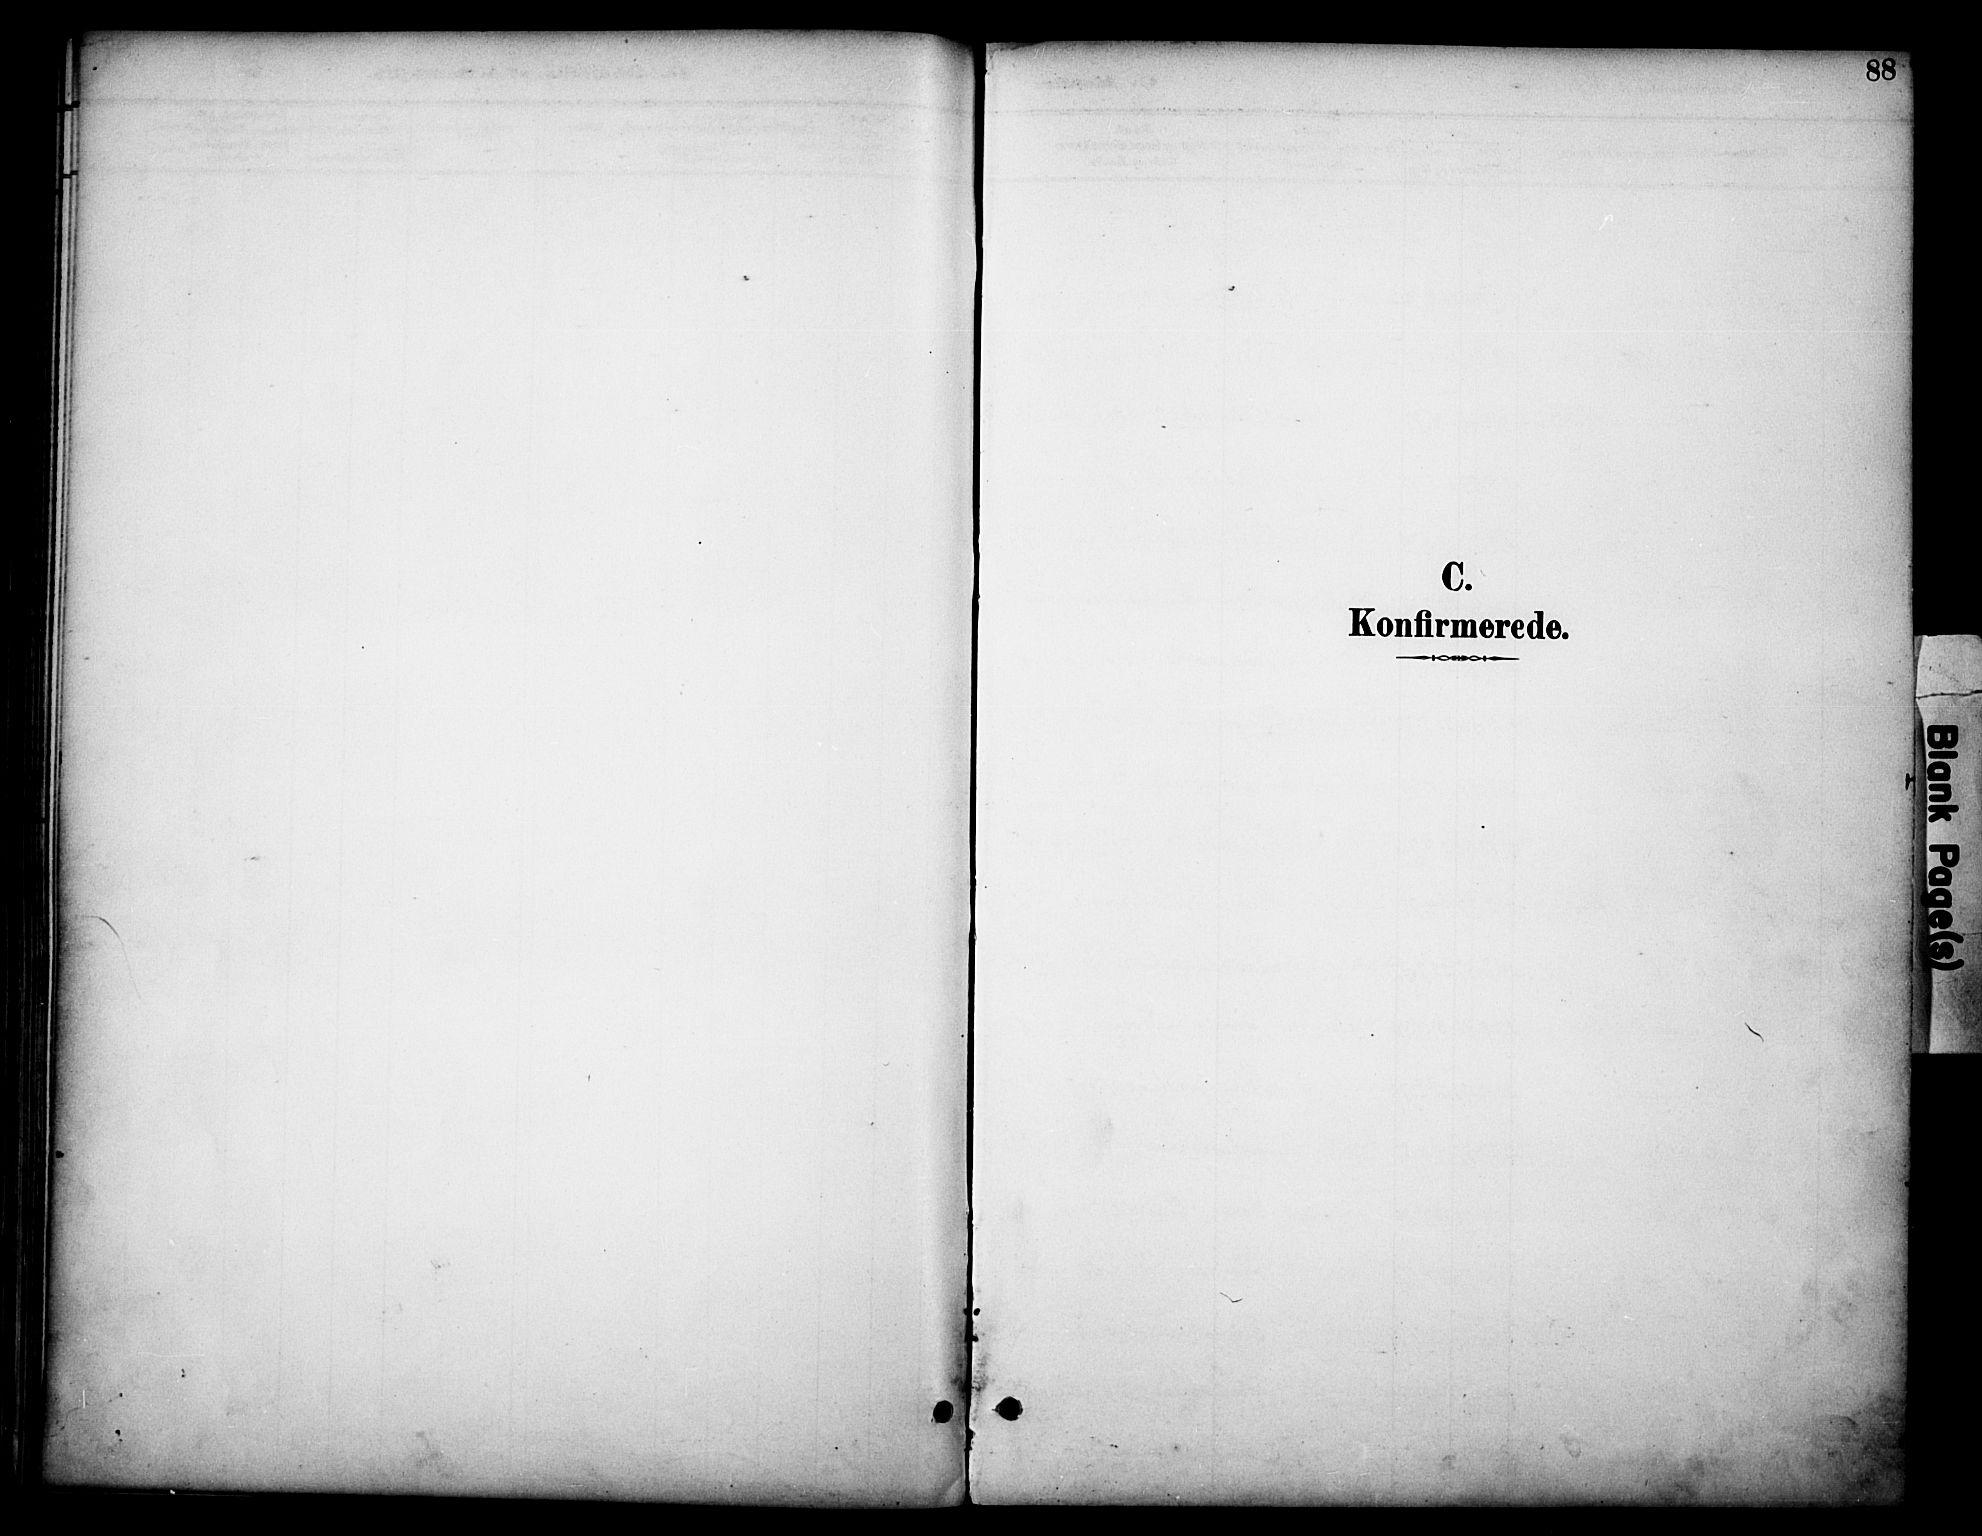 SAH, Dovre prestekontor, Ministerialbok nr. 3, 1891-1901, s. 88